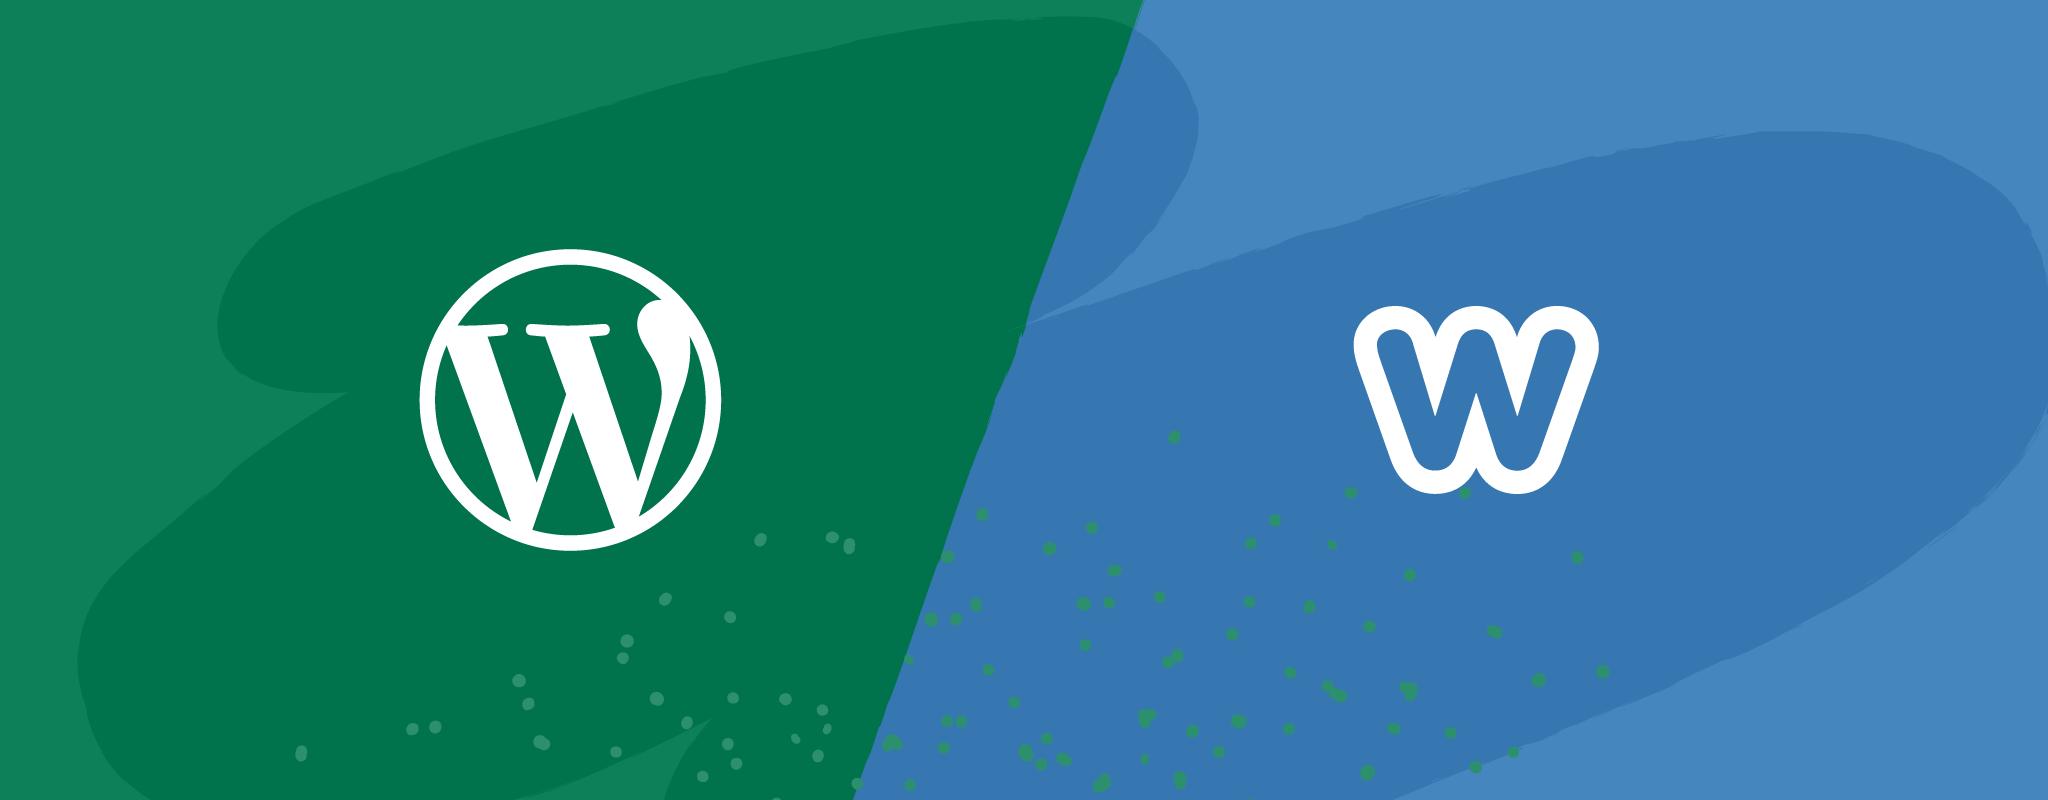 WordPress and Weebly Logos